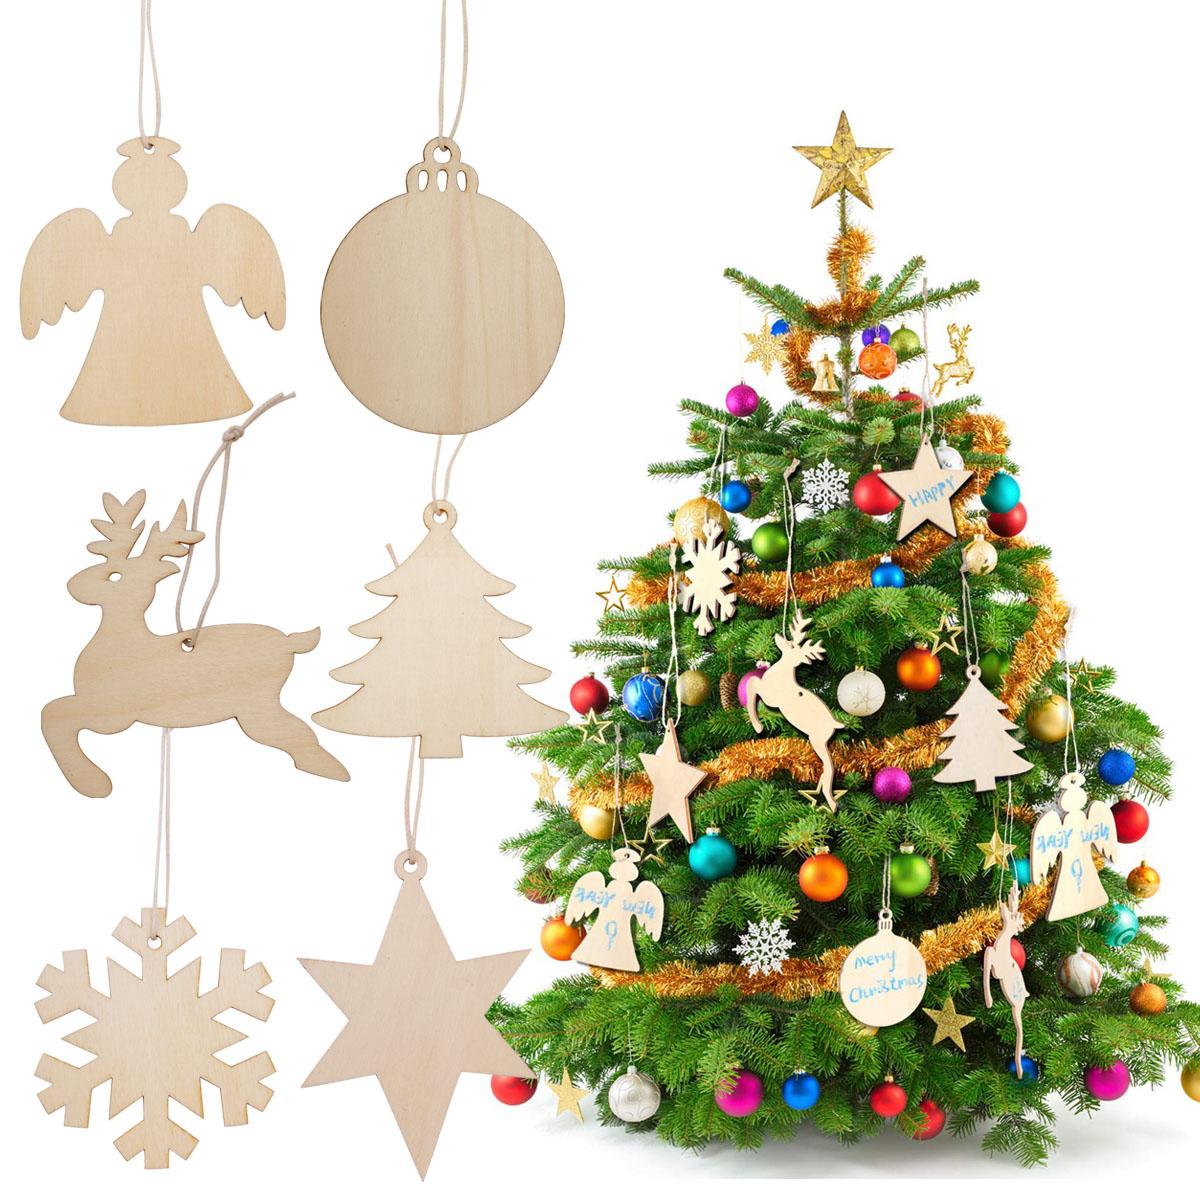 60pcs Wooden Christmas Tree Decoration Set Hanging Ornaments Pendant Gift Tags Ebay